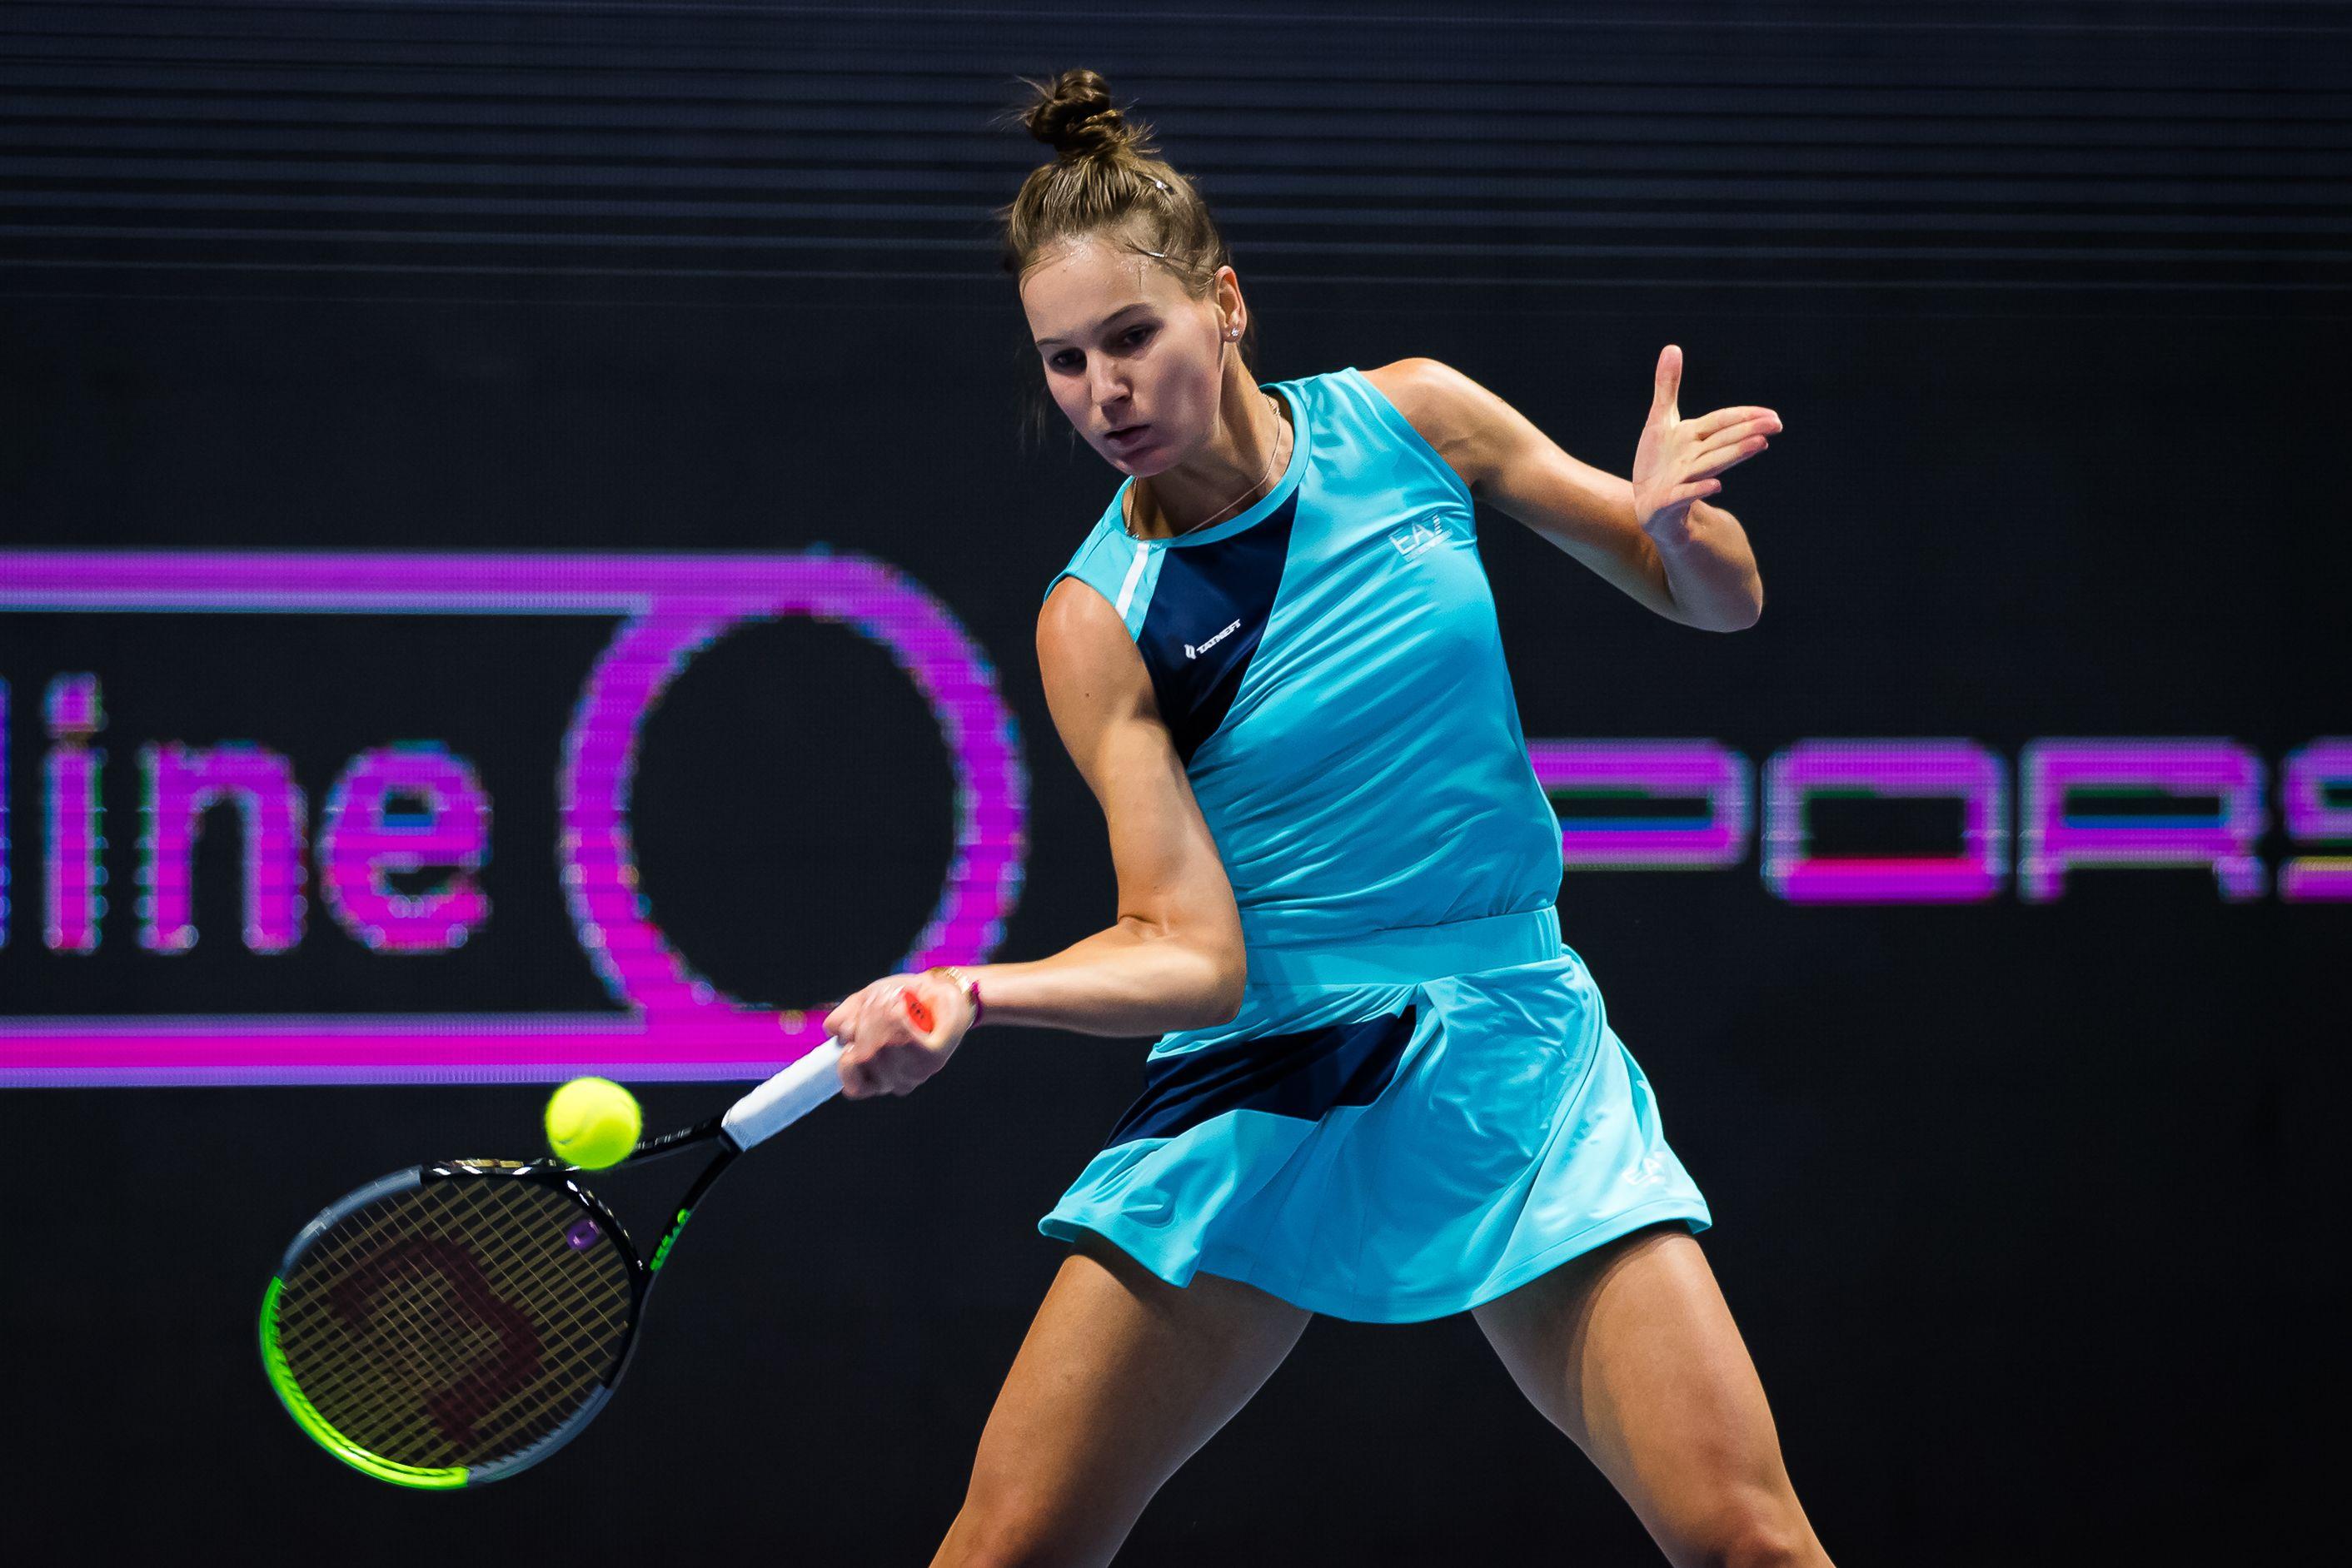 Кудерметова пробилась в 1/2 финала турнира в Чарльстоне